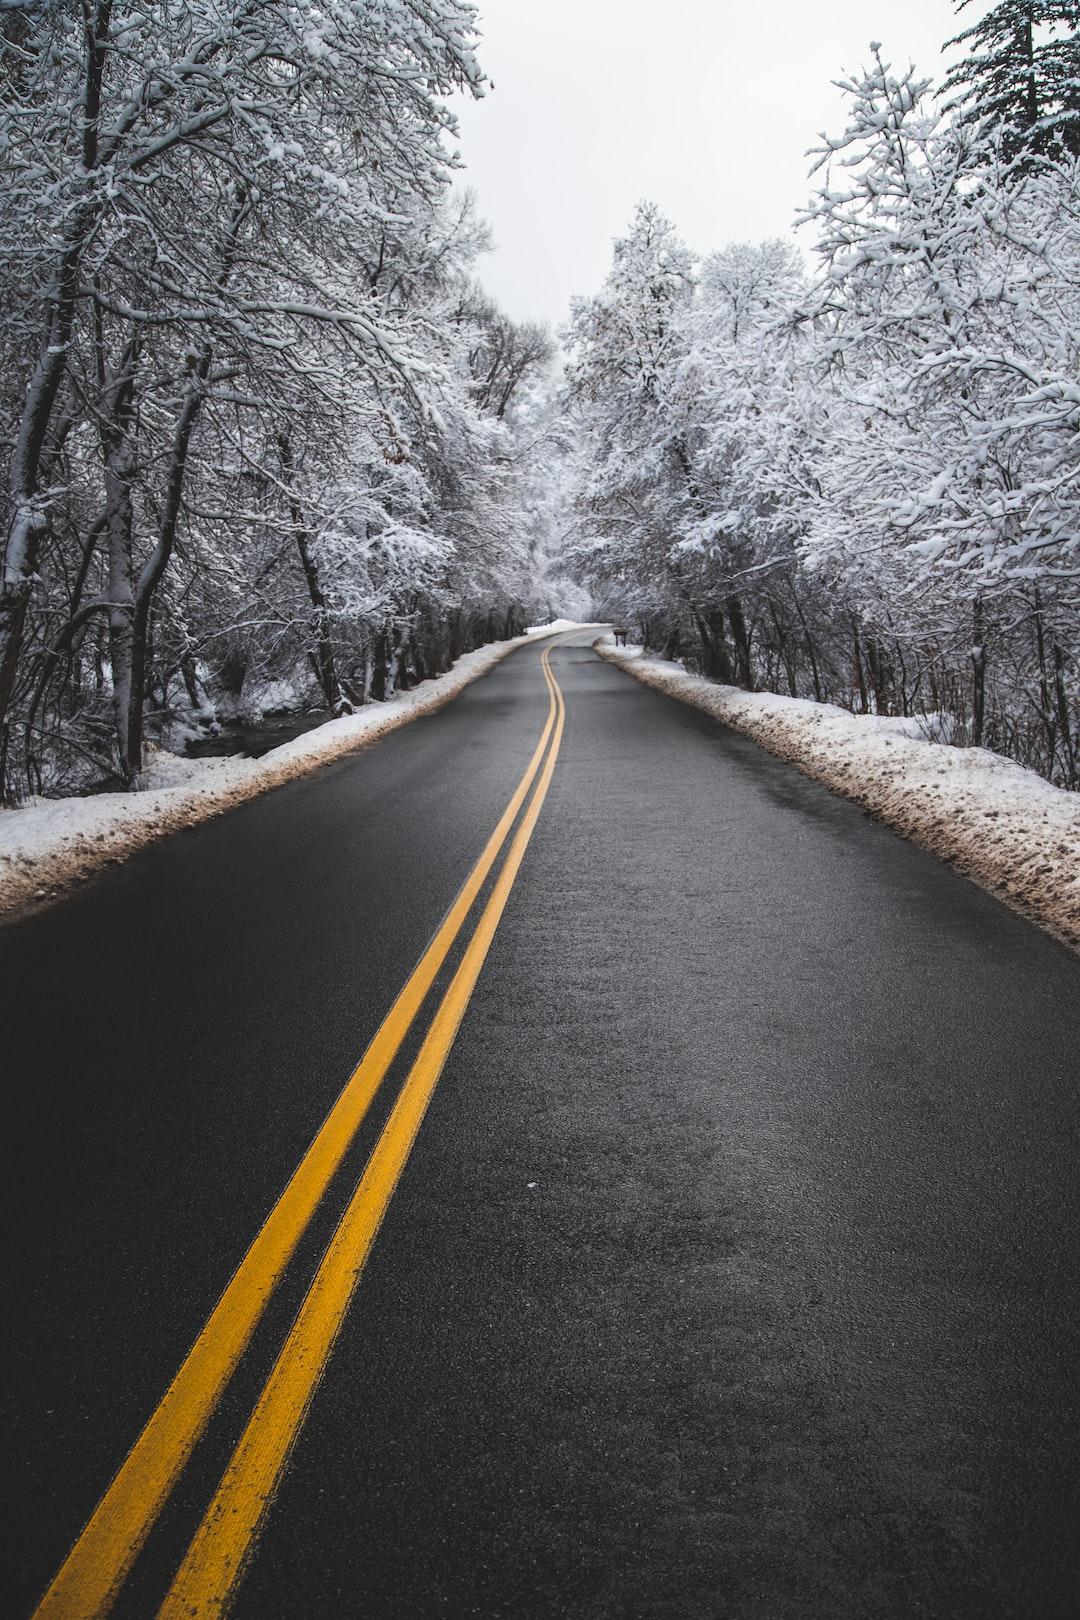 black asphalt road between snow covered trees during daytime